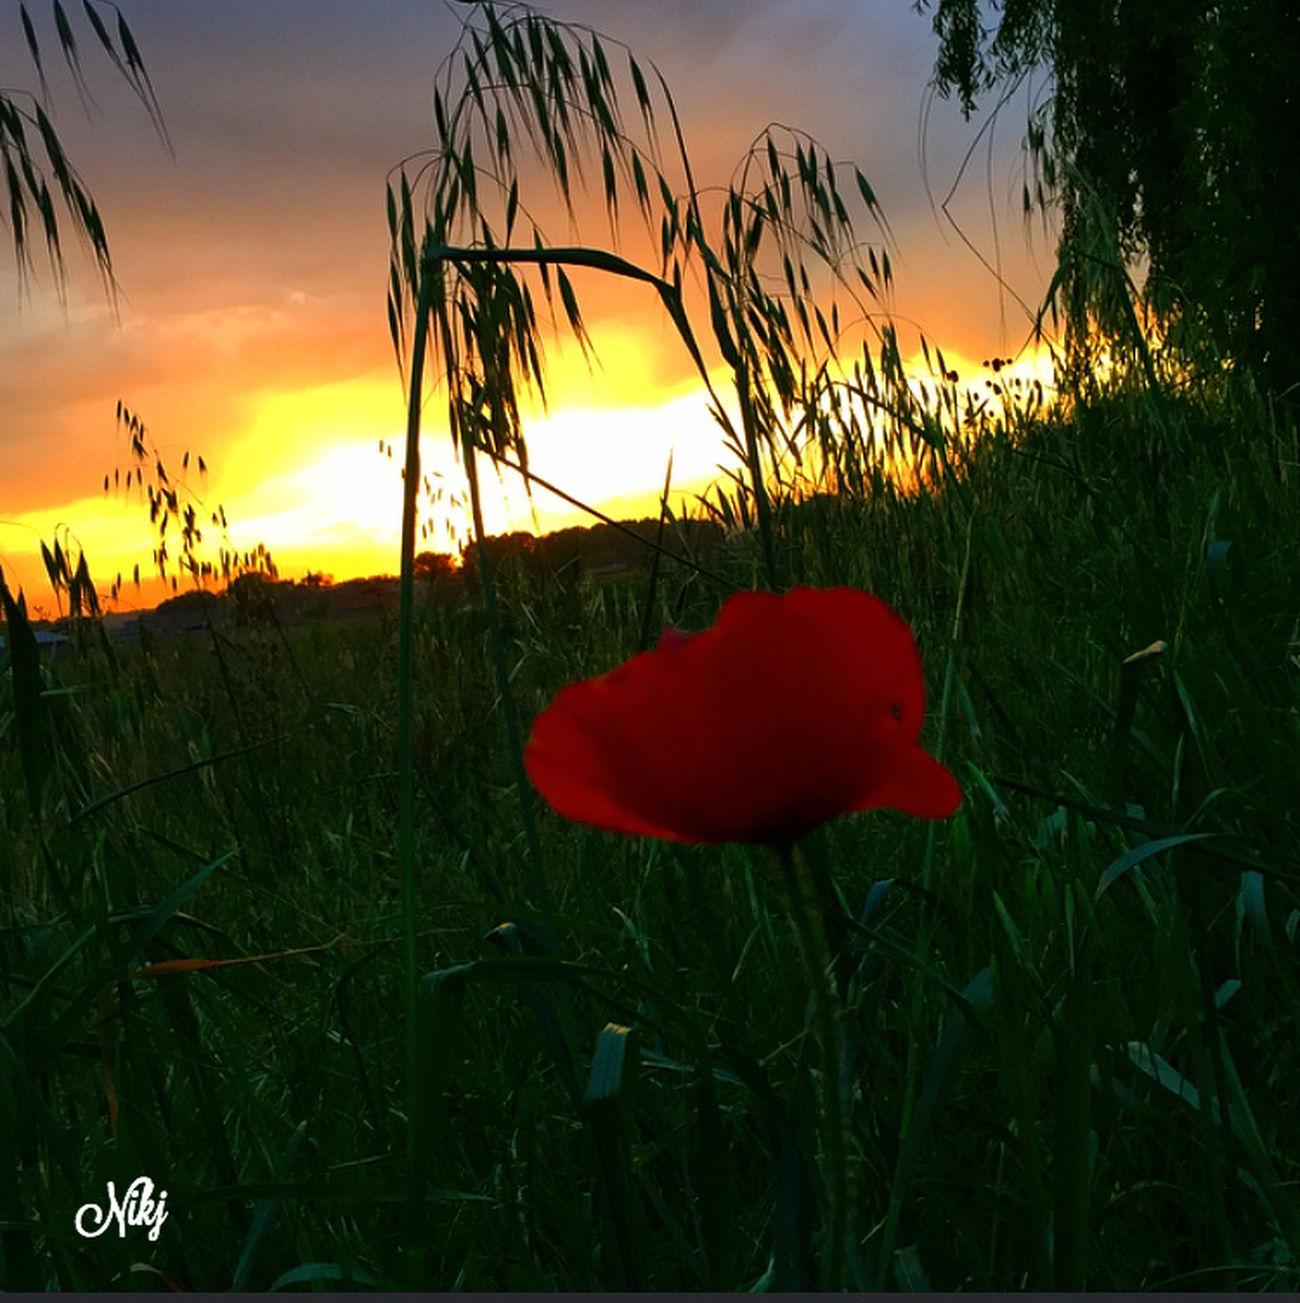 http://youtu.be/qSeHSz_SQj8 ------------------------------------ 🎶vedrai, vedrai vedrai che cambierà forse non sarà domani ma un bel giorno cambierà vedrai, vedrai no, non son finito sai non so dirti come e quando ma un bel giorno cambierà....🎶 Luigi Tenco Sunset #sun #clouds #skylovers #sky #nature #beautifulinnature #naturalbeauty #photography #landscape Sunset #sun #clouds #skylovers #sky #nature #beautifulinnature #naturalbeauty Photography Landscape ? Flowers,Plants & Garden Tramonti__italiani Particolaristupendi